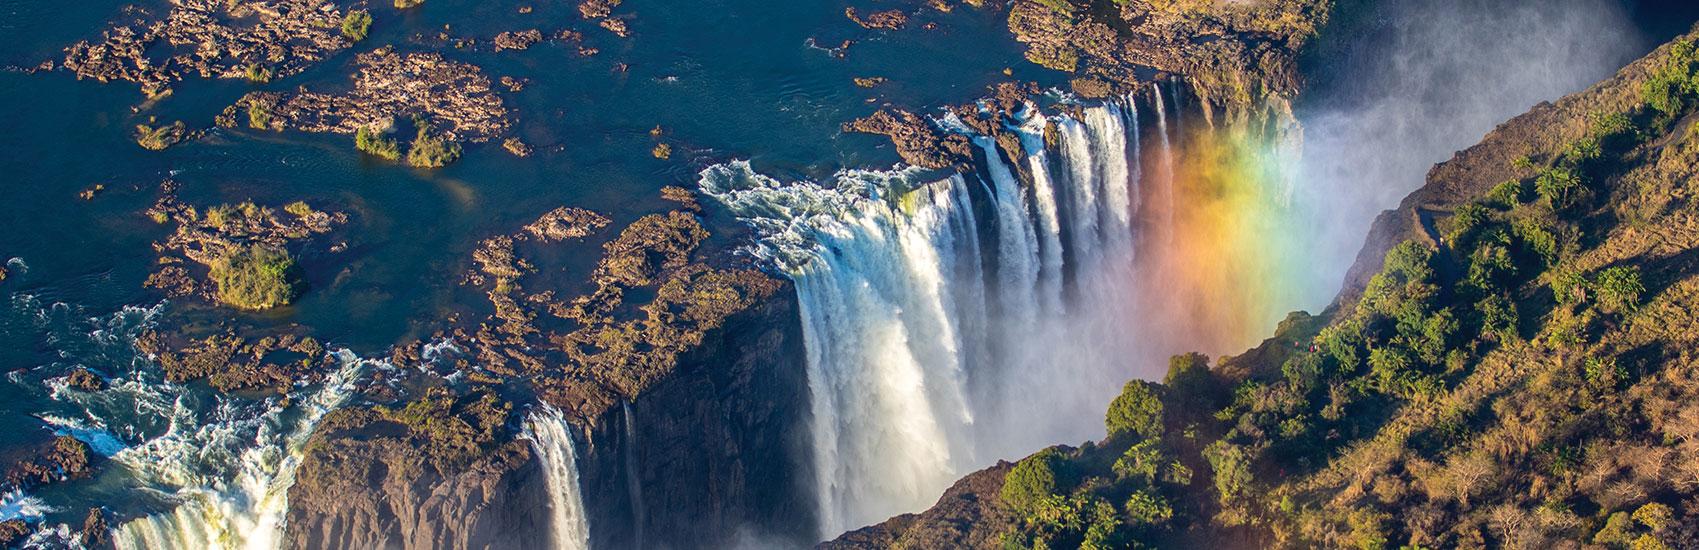 Luxury Escorted South African Safari 5